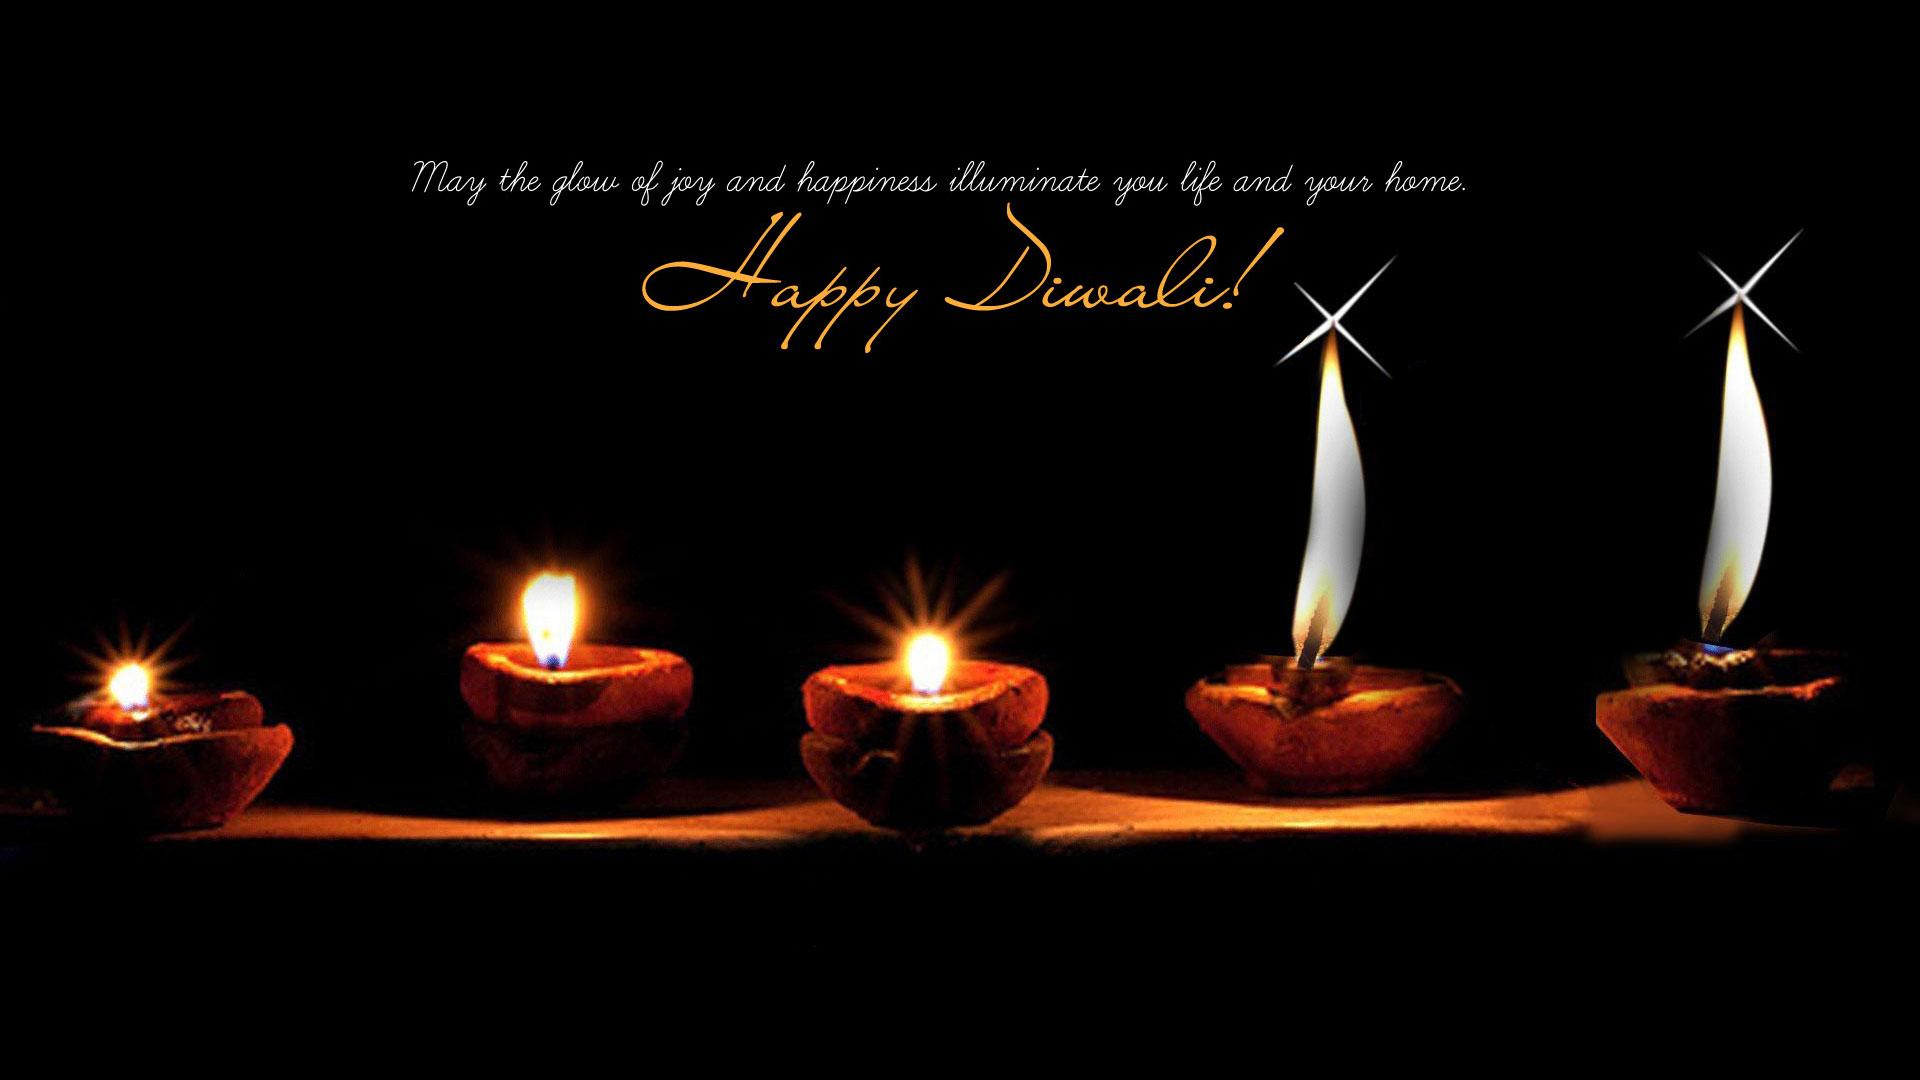 happy diwali widescreen hd - photo #1